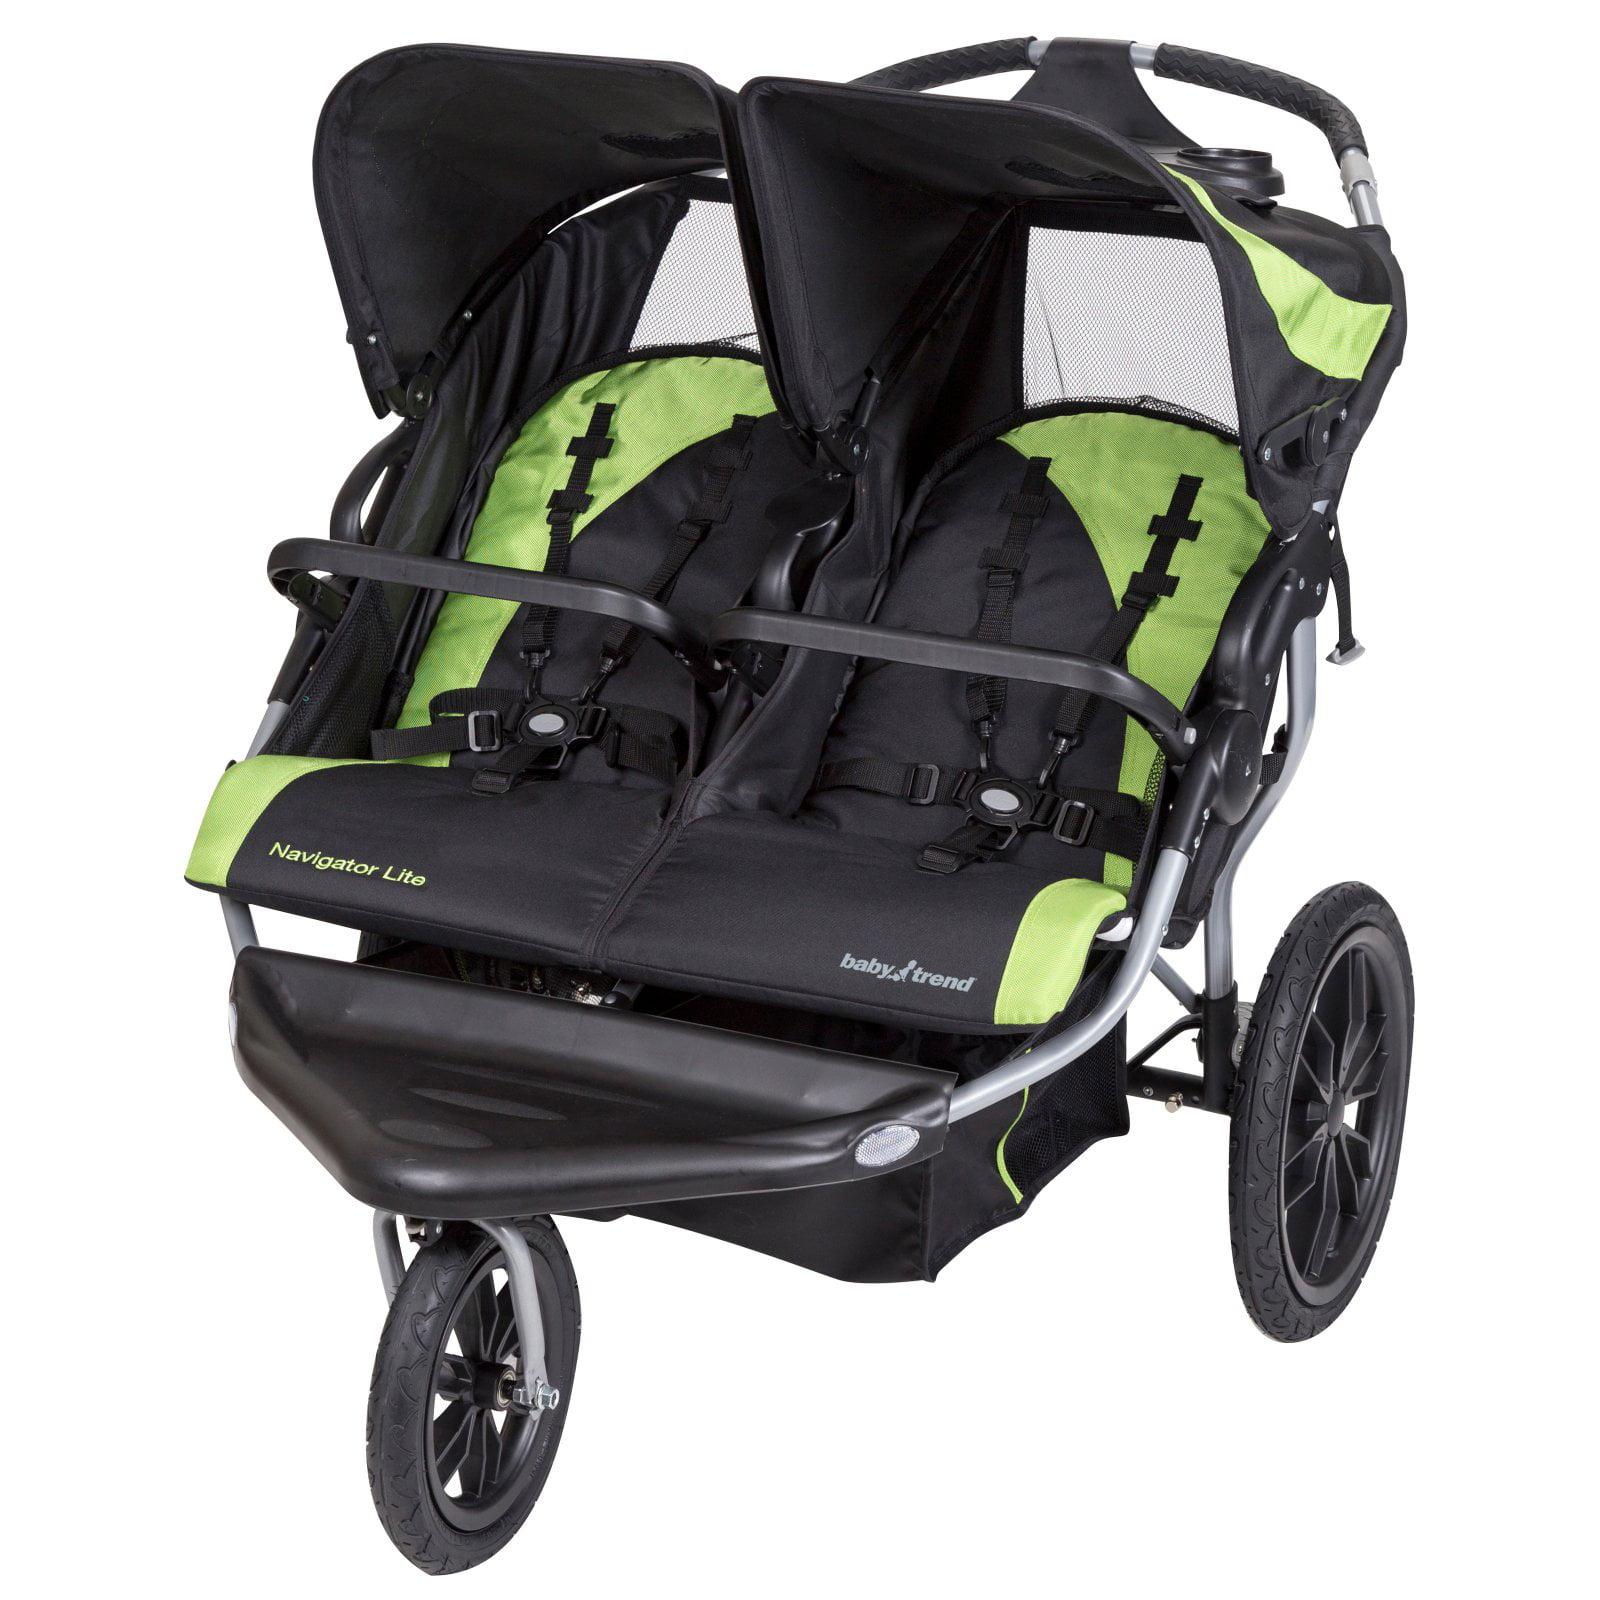 Baby Trend Navigator Lite Double Jogging Stroller Lincoln